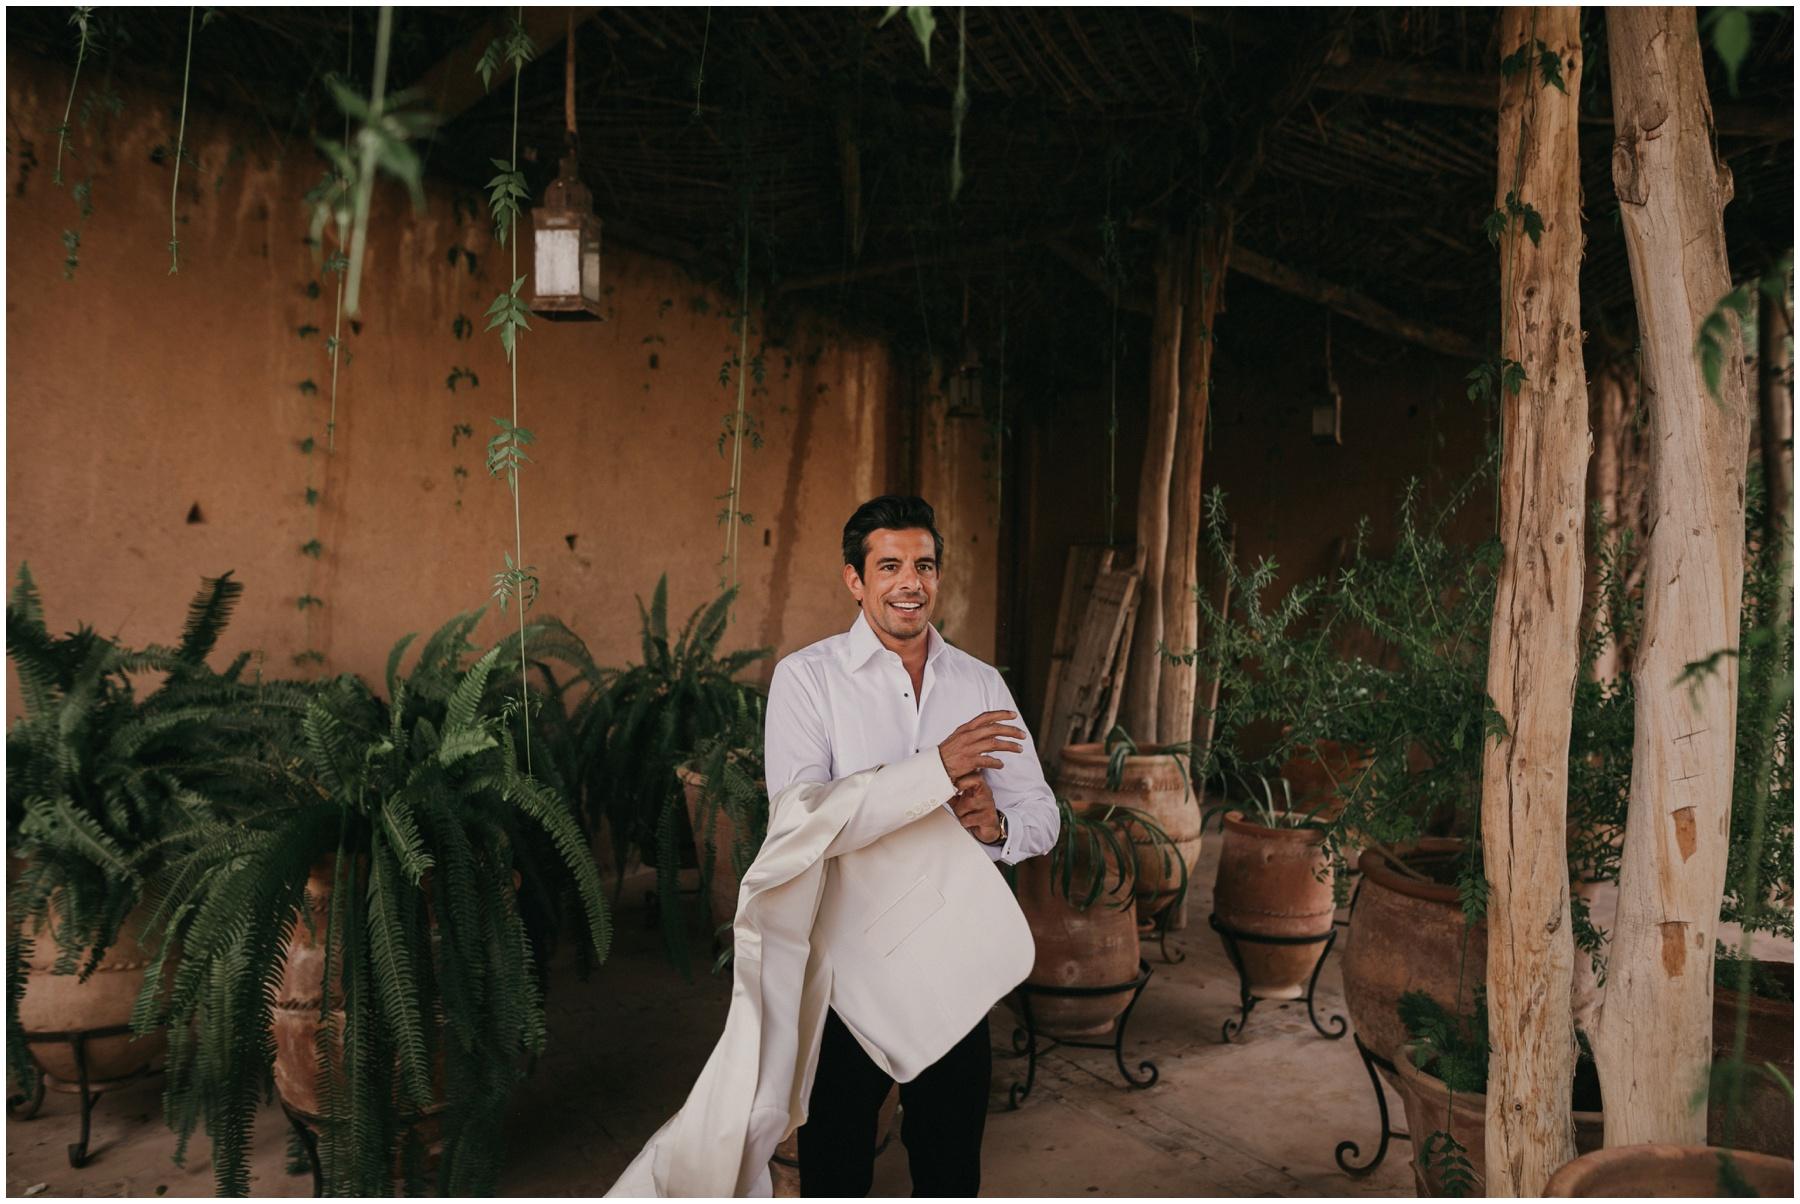 Marrakech Wedding Beldi Coutry Club 009.JPG